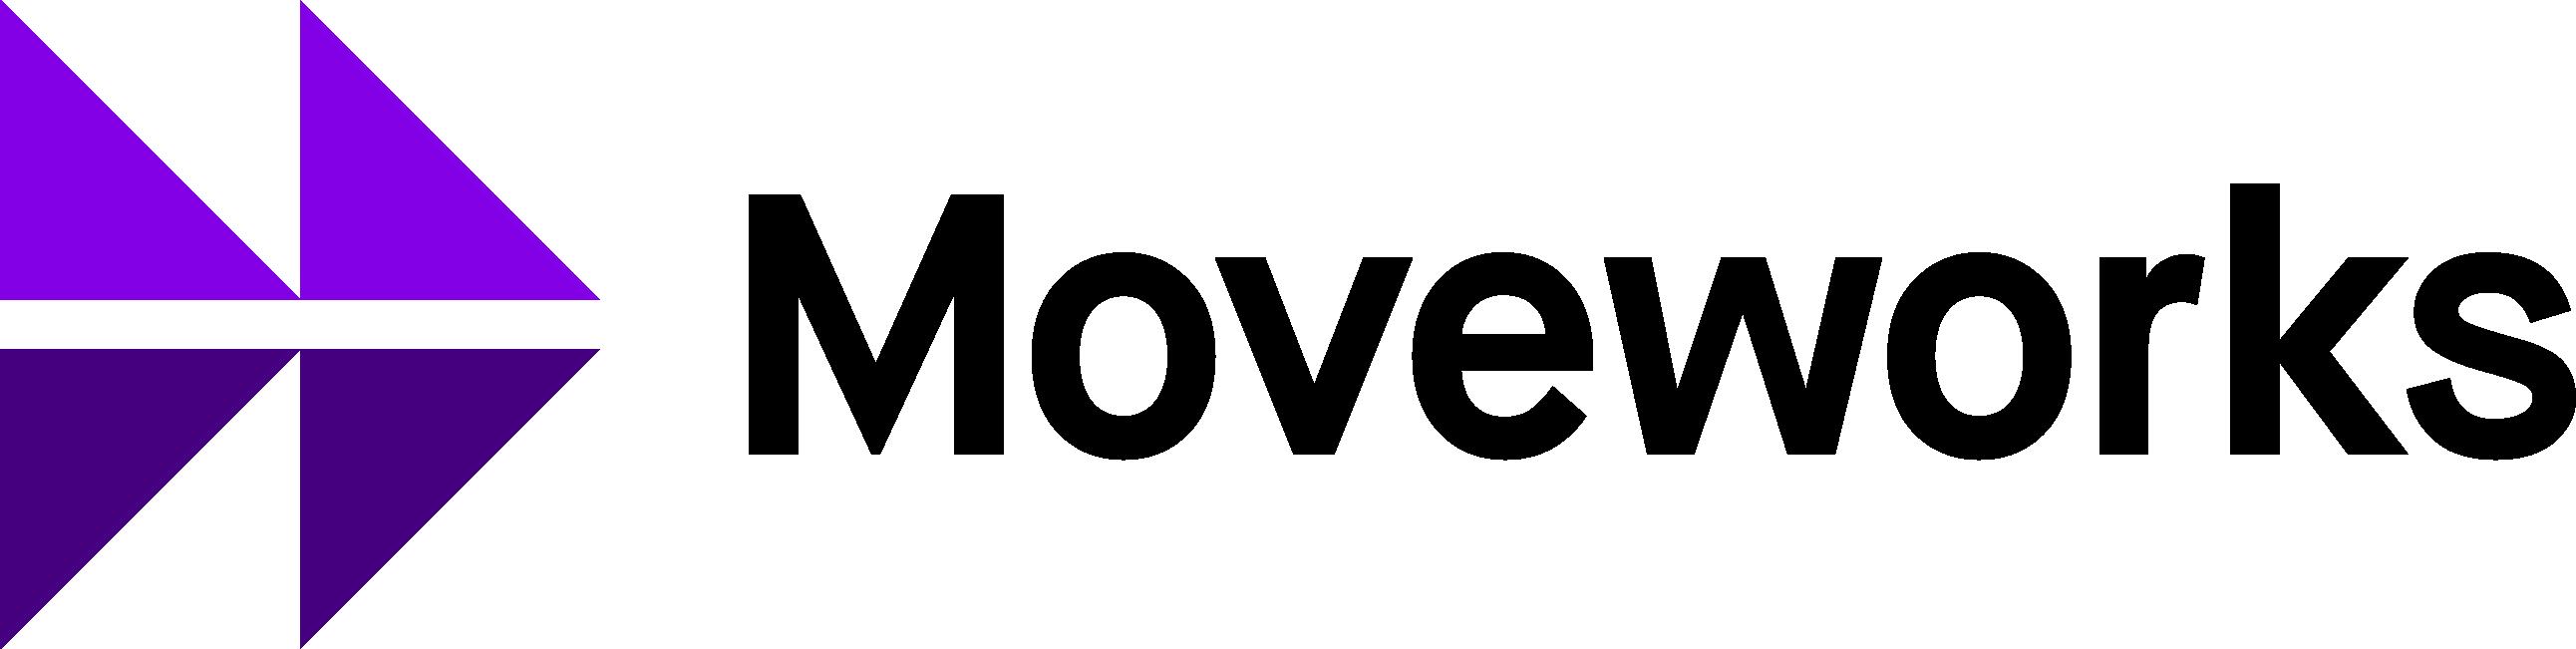 Microfocus Company Logo